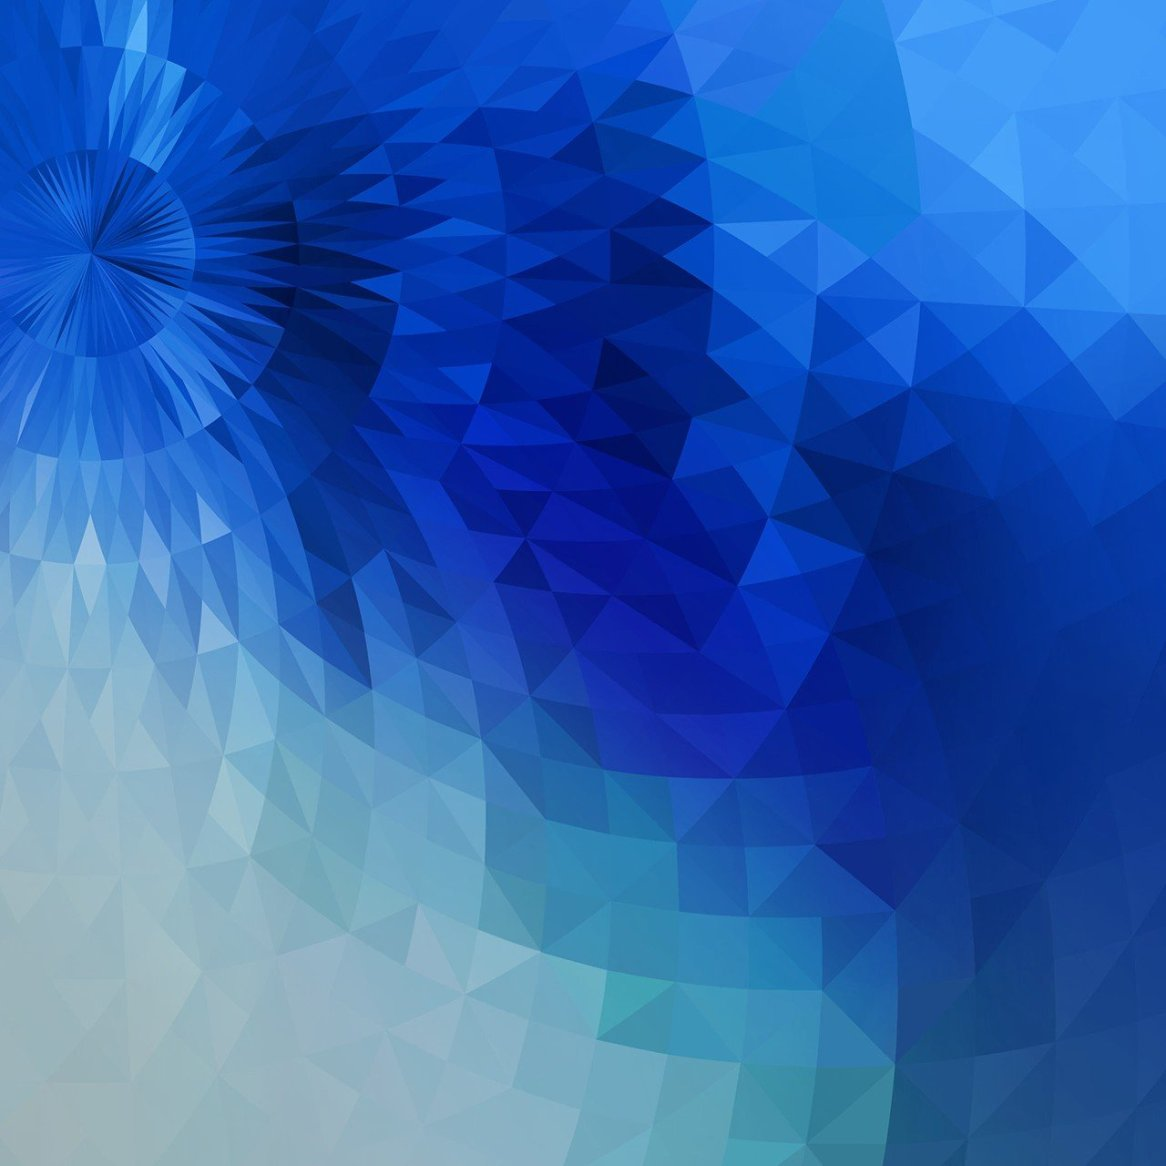 Samsung-Galaxy-J7-Duo-Stock-HD-Wallpapers-Mohamedovic-04